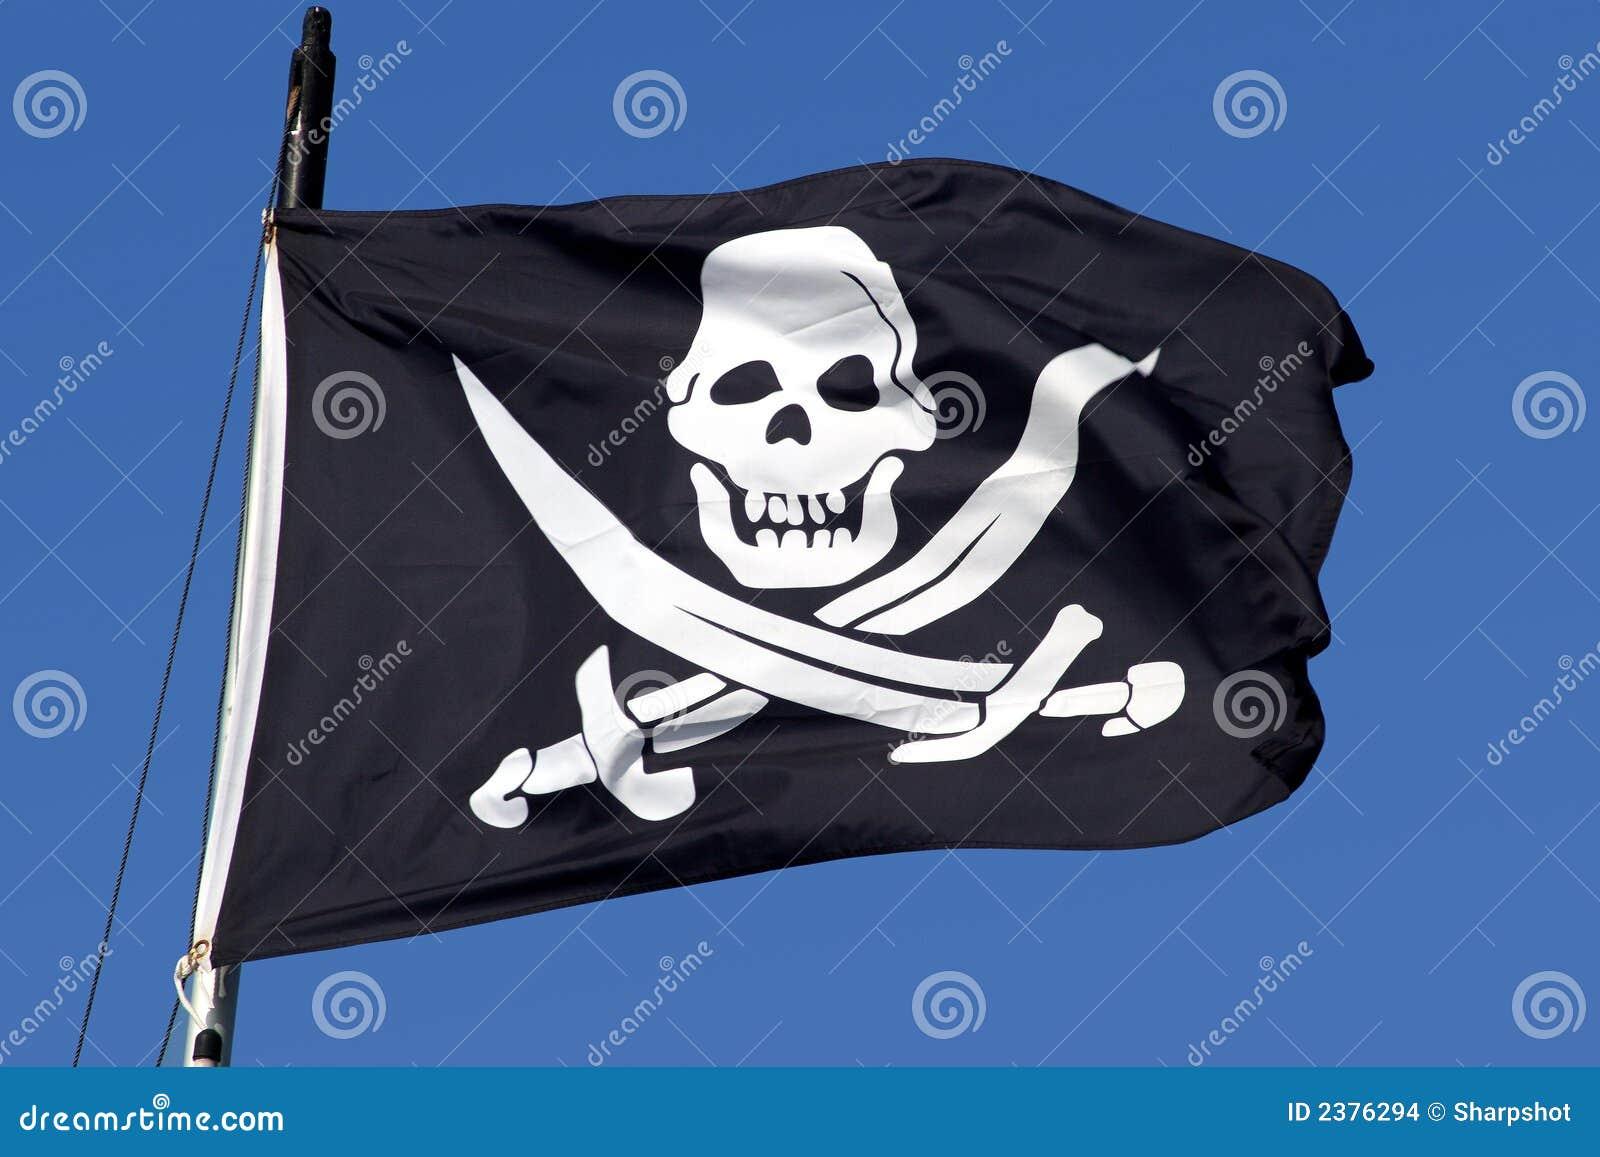 A pirate ship flag.